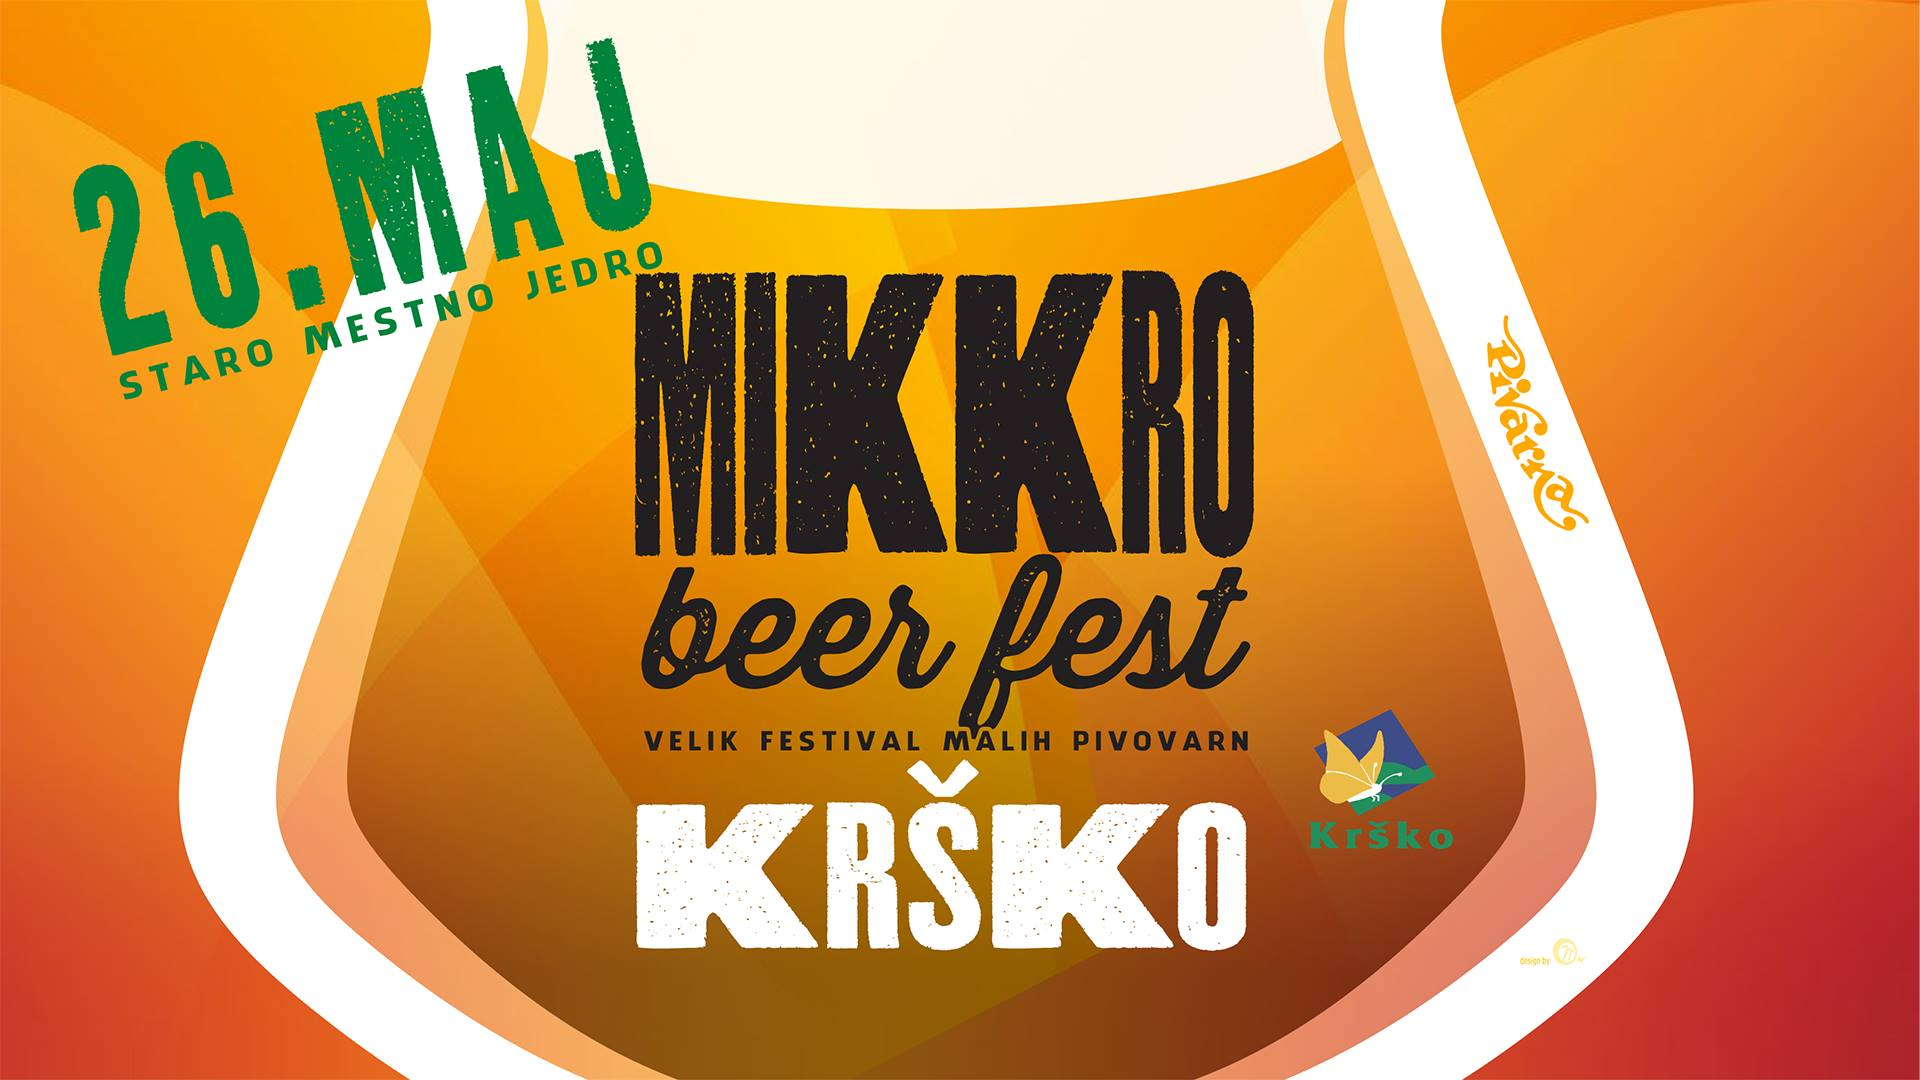 Slo Craft Beer Fest